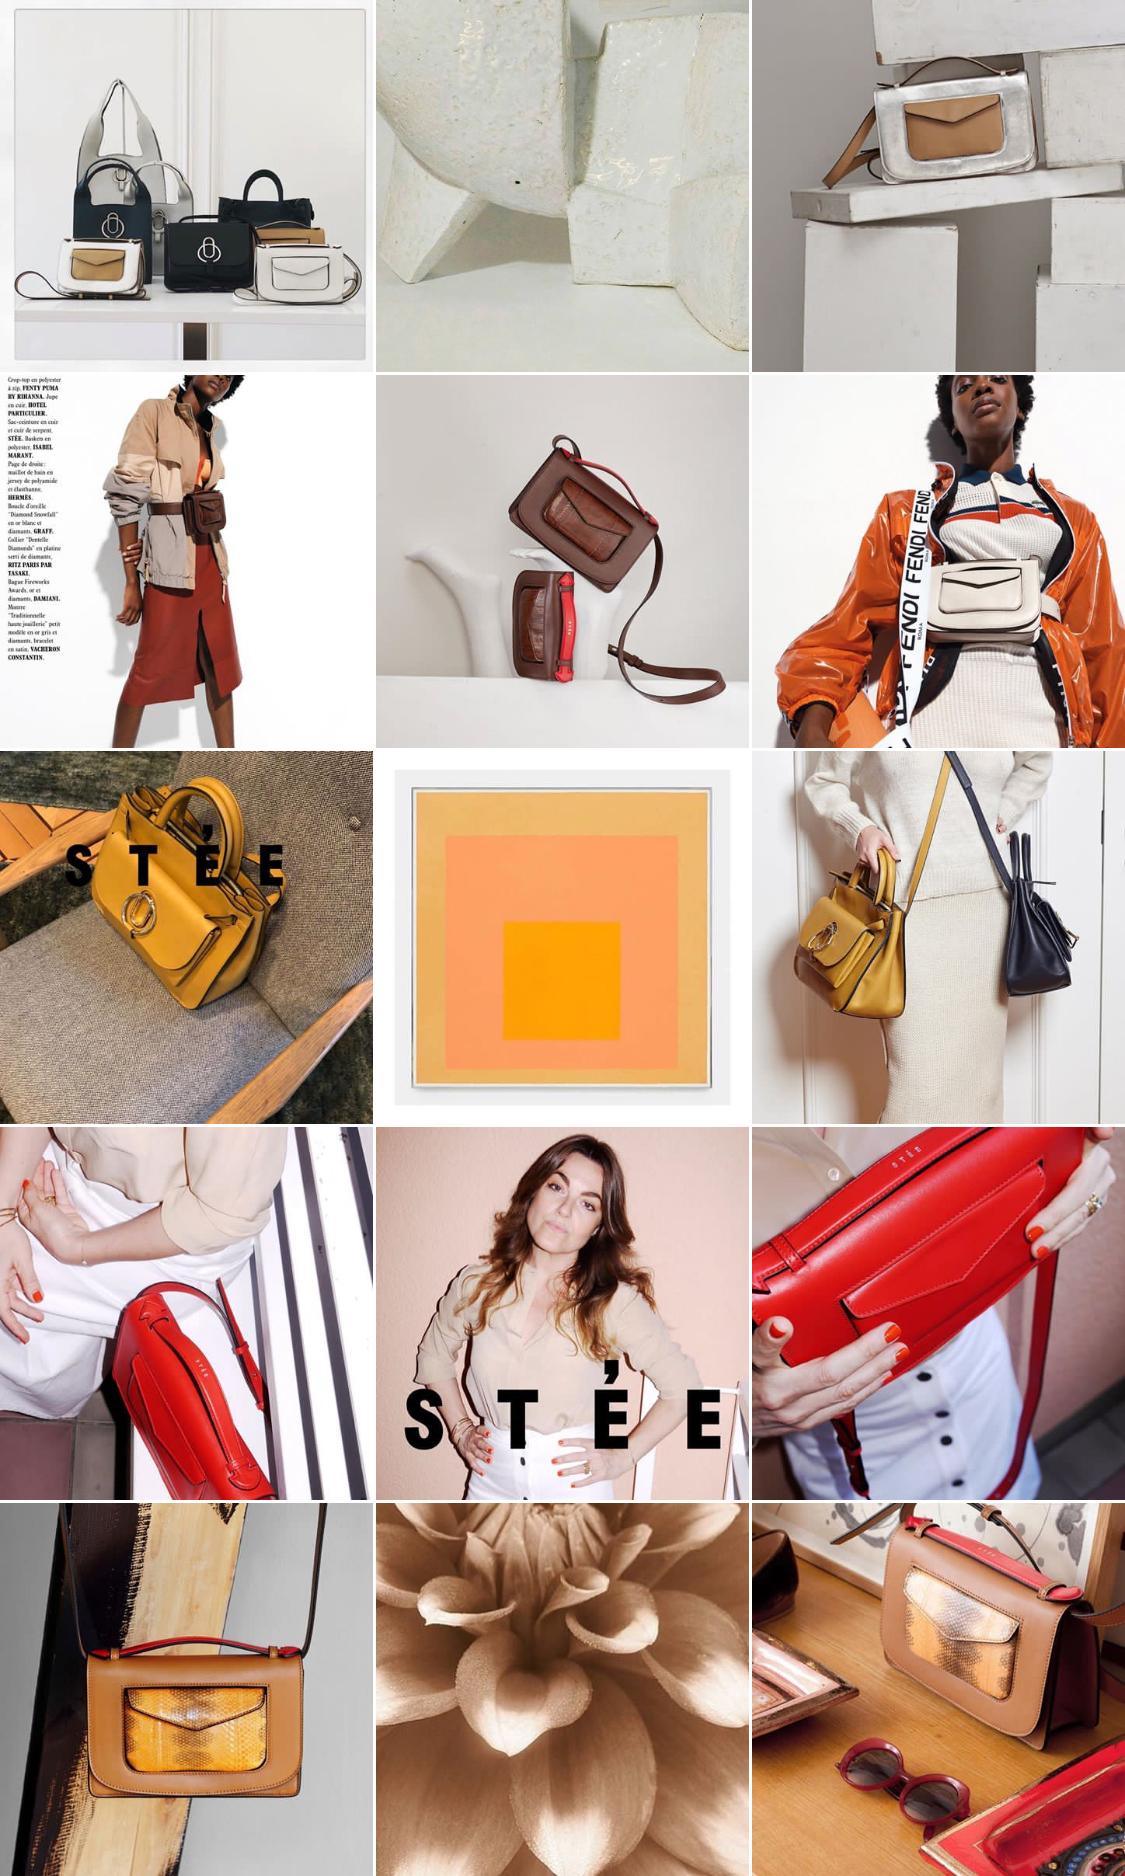 STEE_Instafeed5.jpg